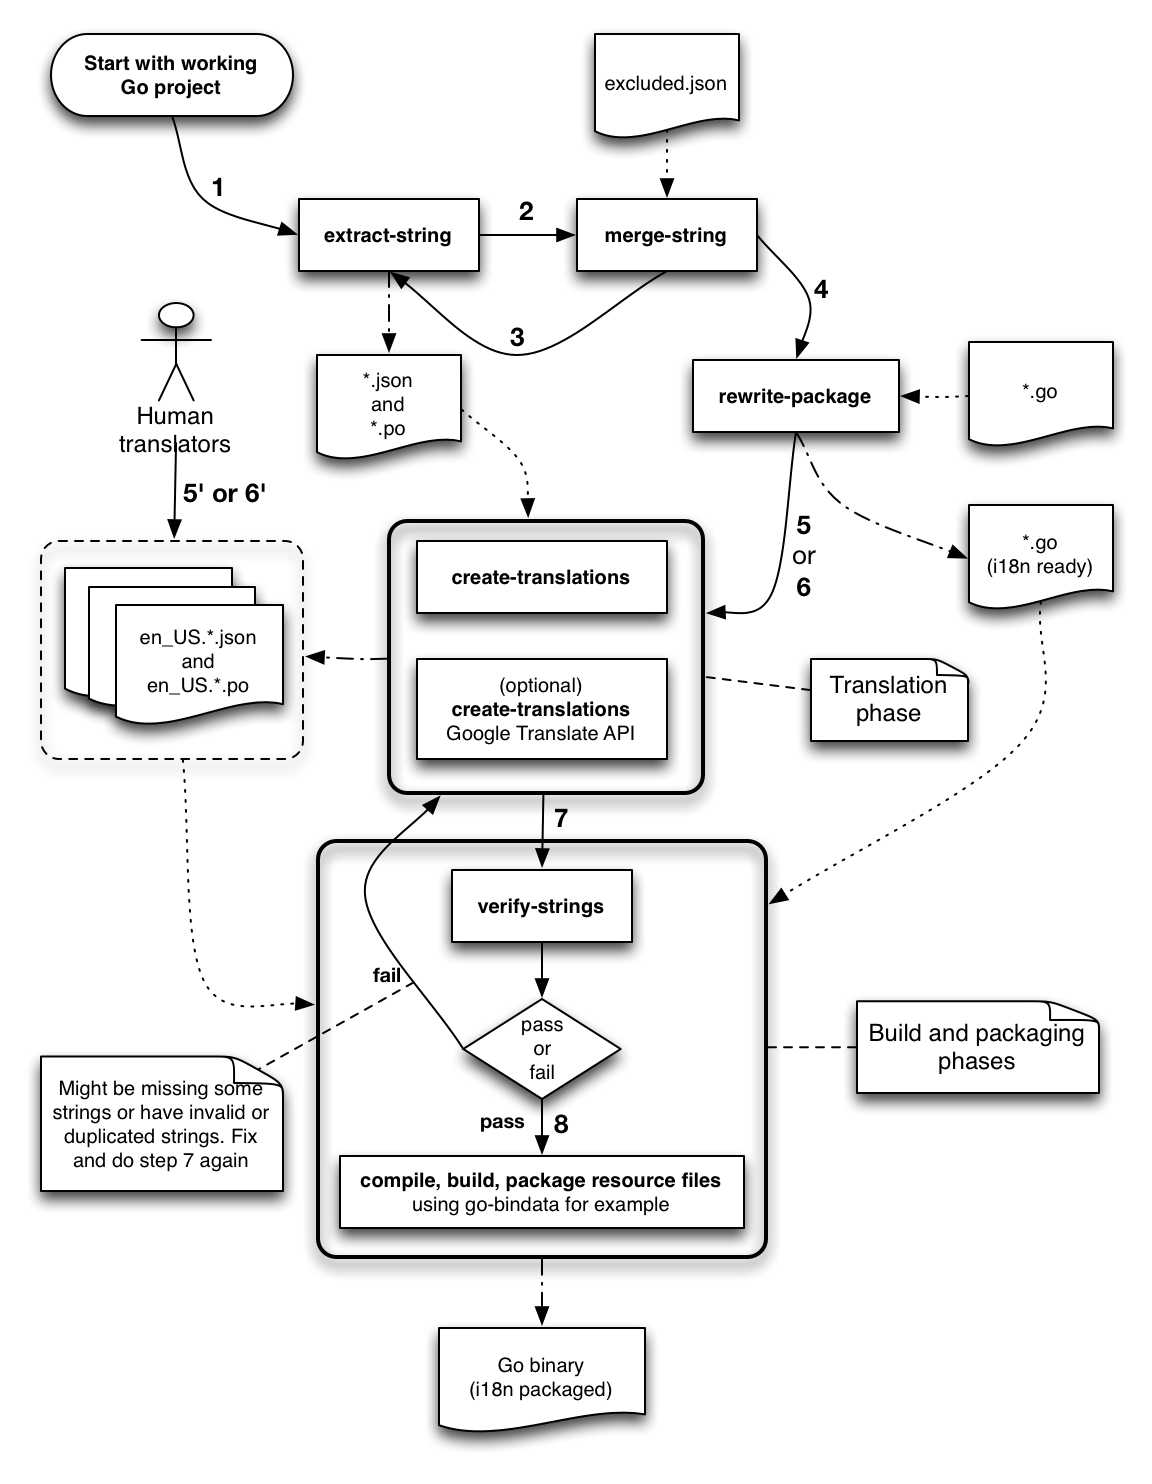 Typical i18n4go workflow diagram